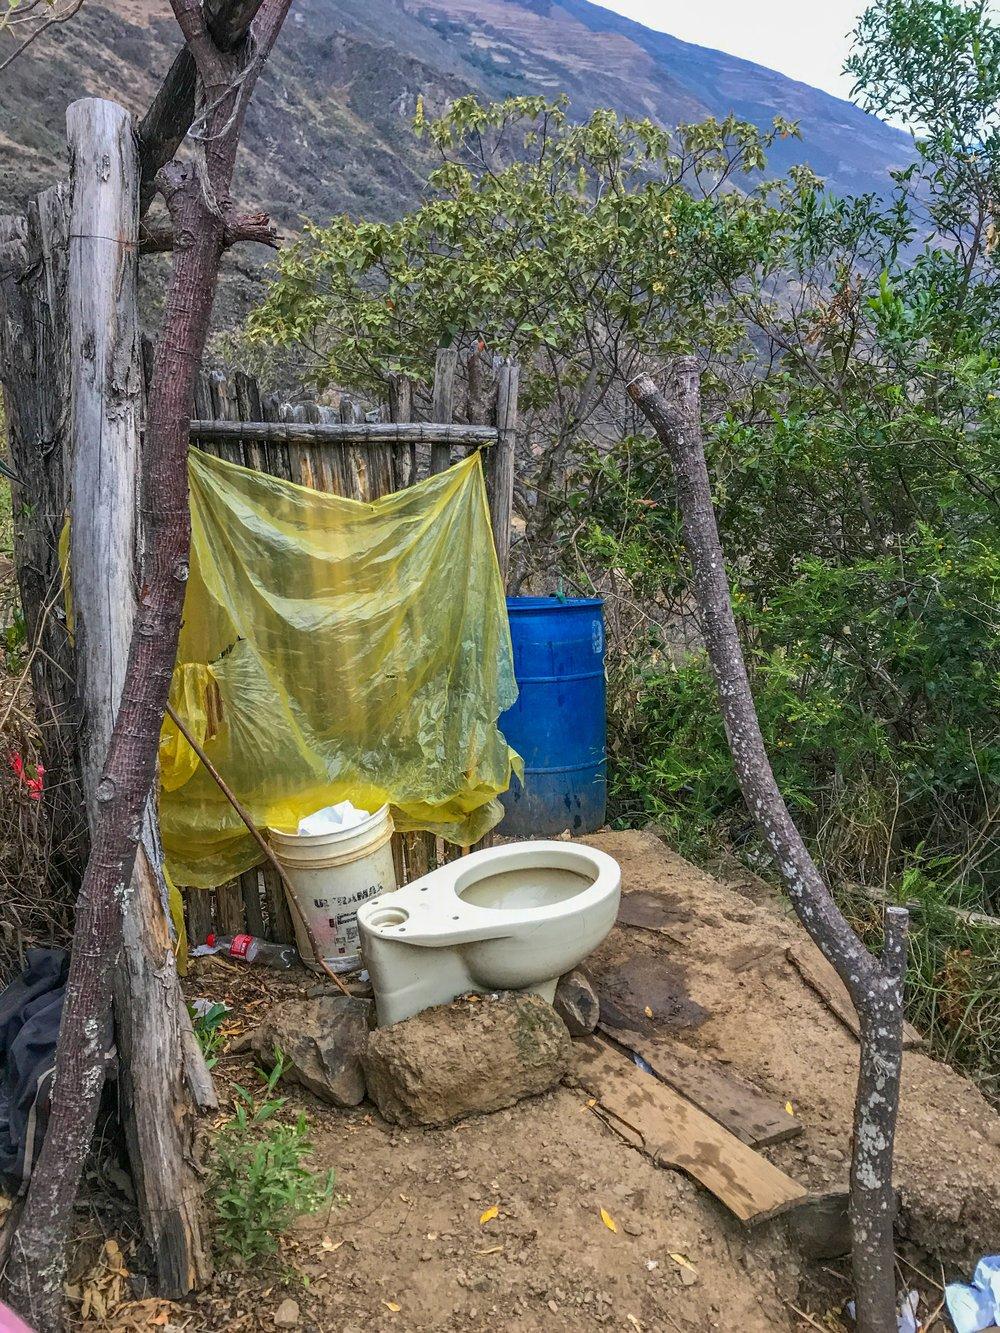 """Of course this campsite has a bathroom"""